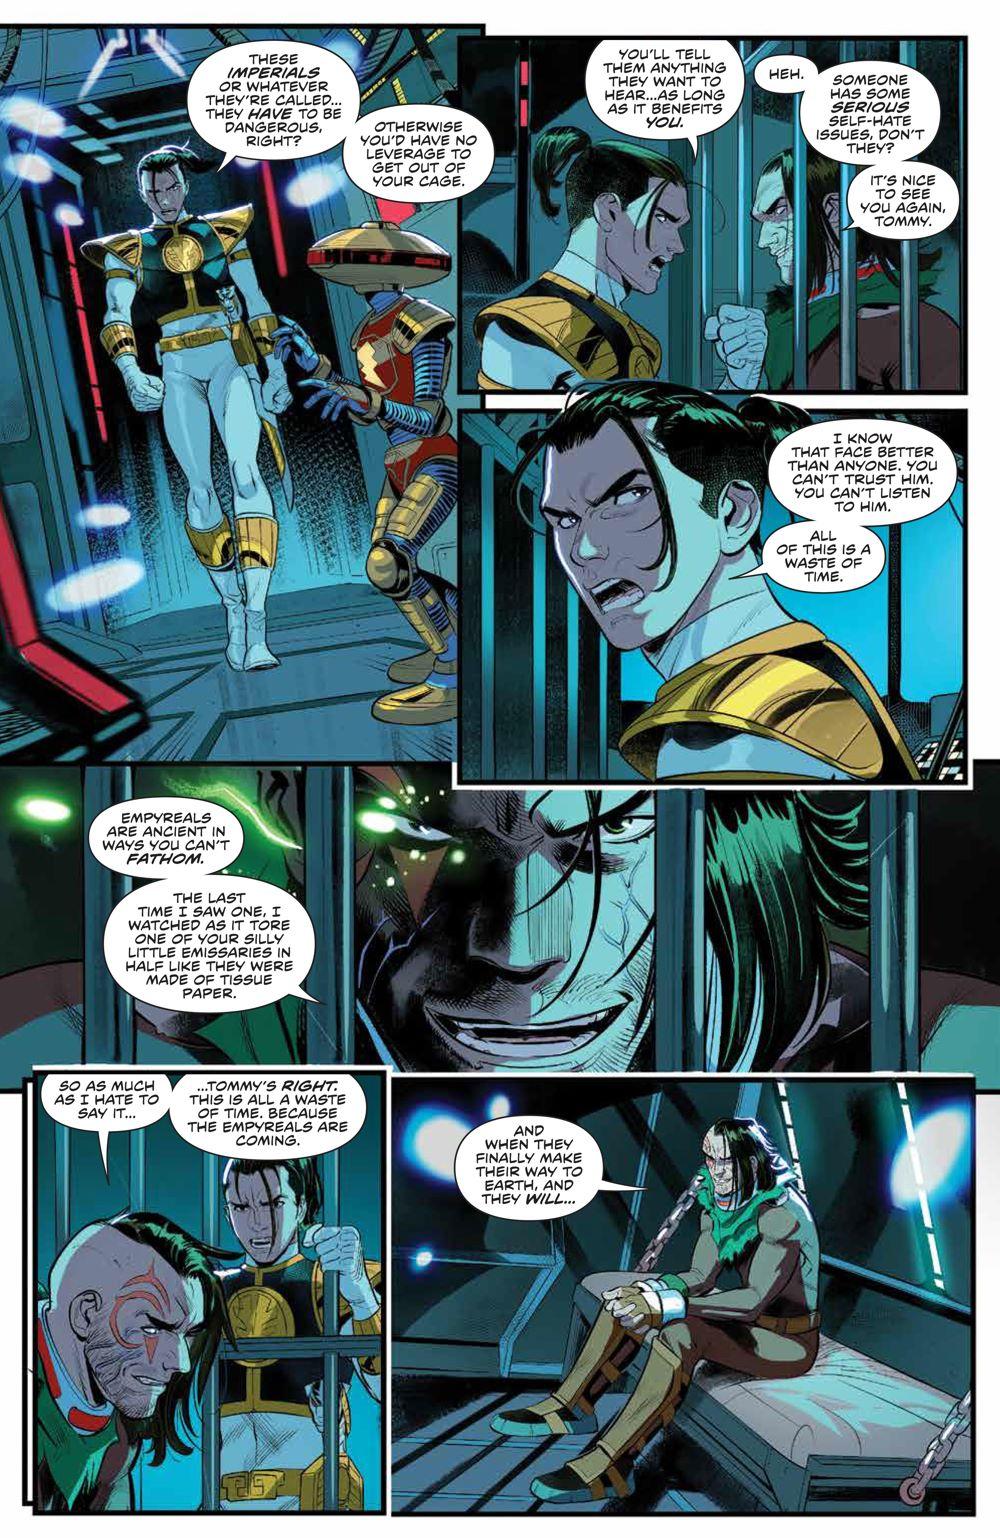 PowerRangers_v1_SC_PRESS_16 ComicList Previews: POWER RANGERS VOLUME 1 TP